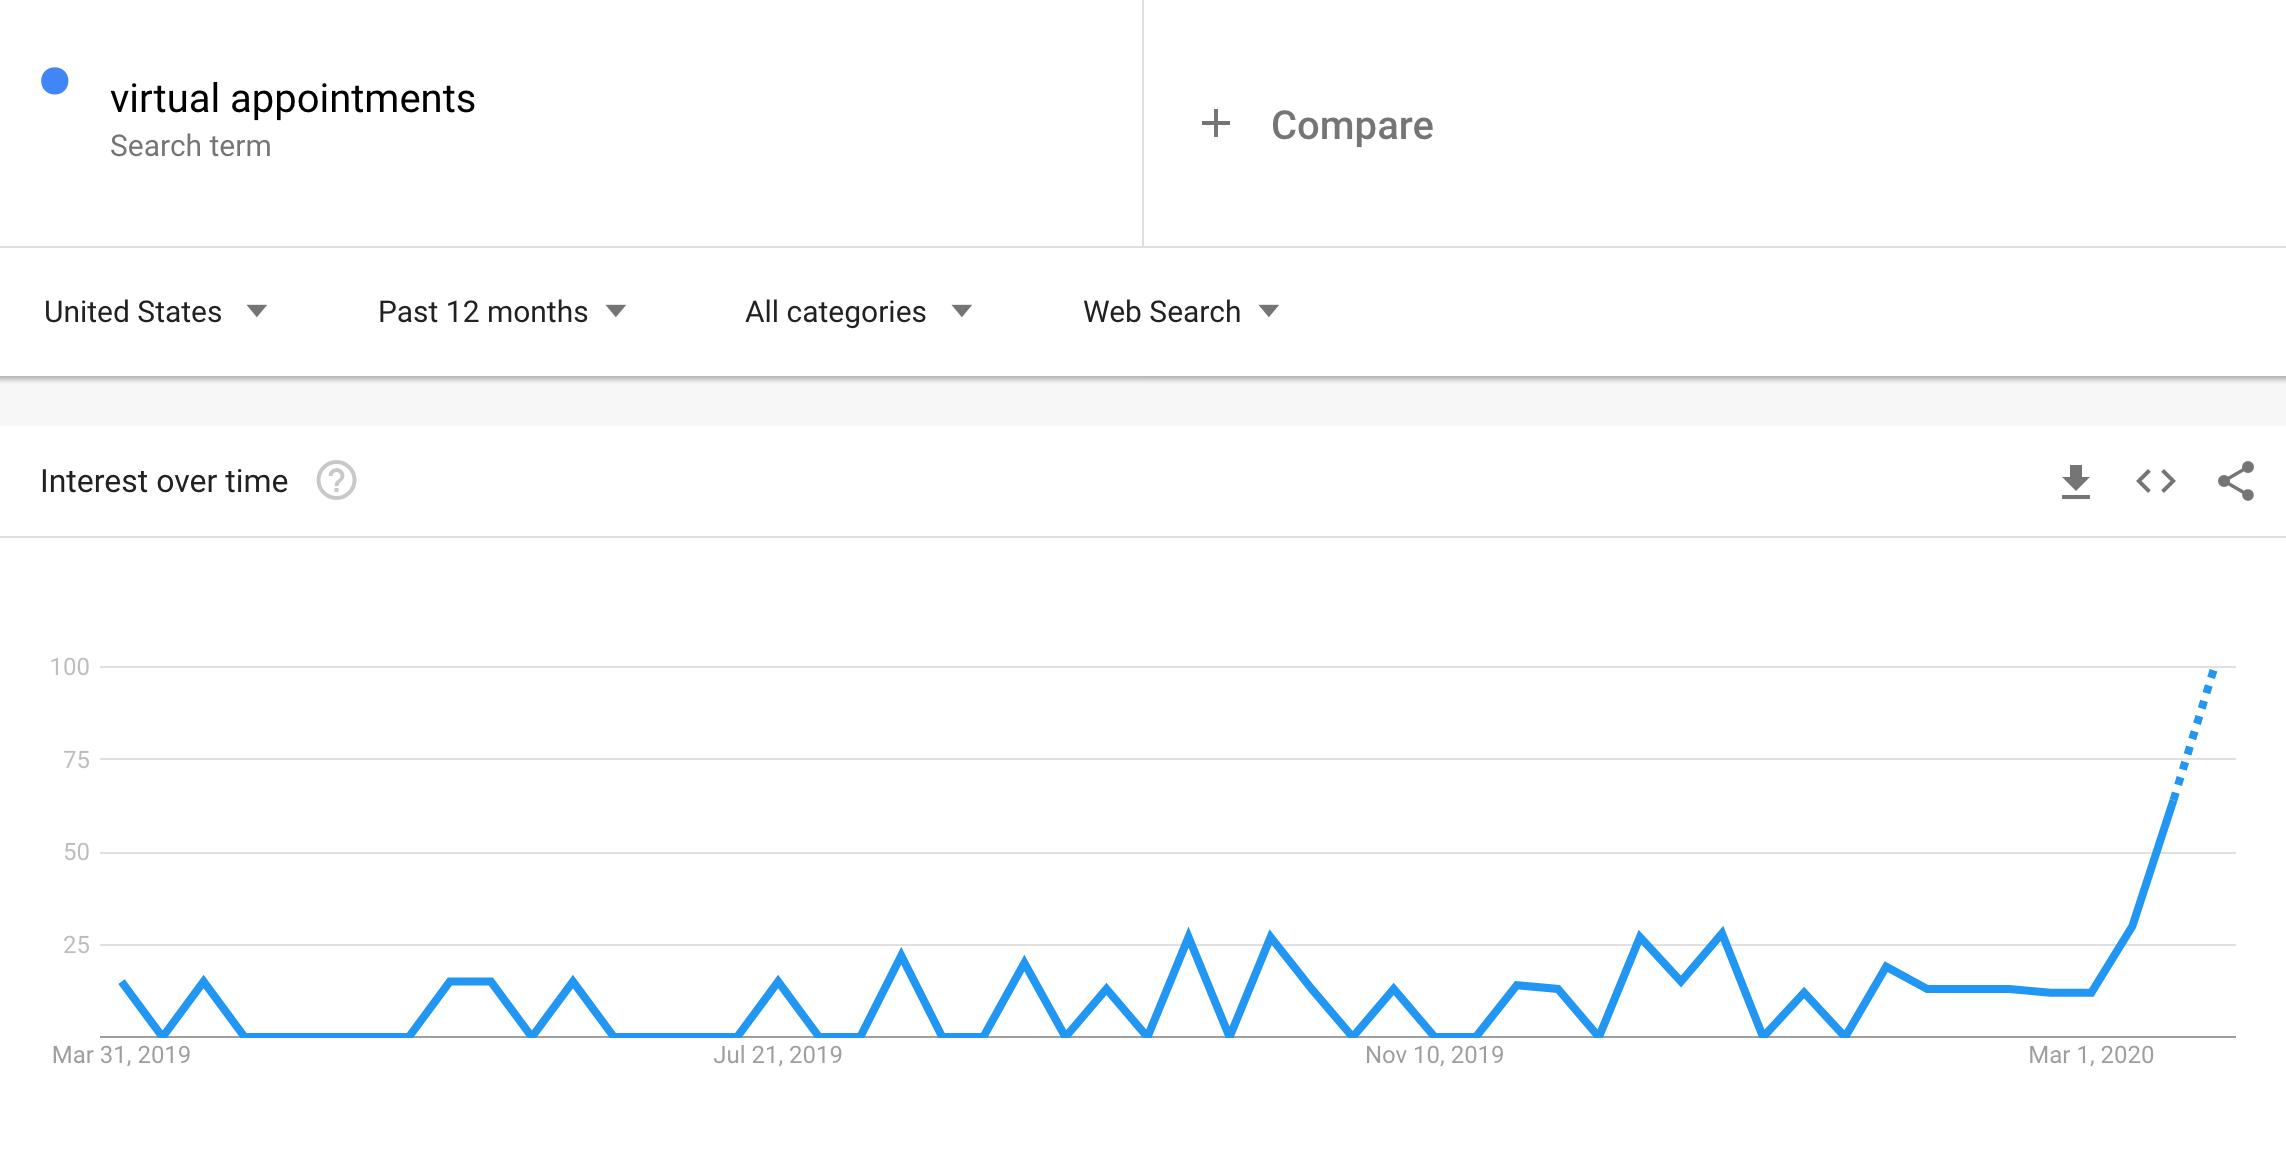 virutal-appointments-google-trends